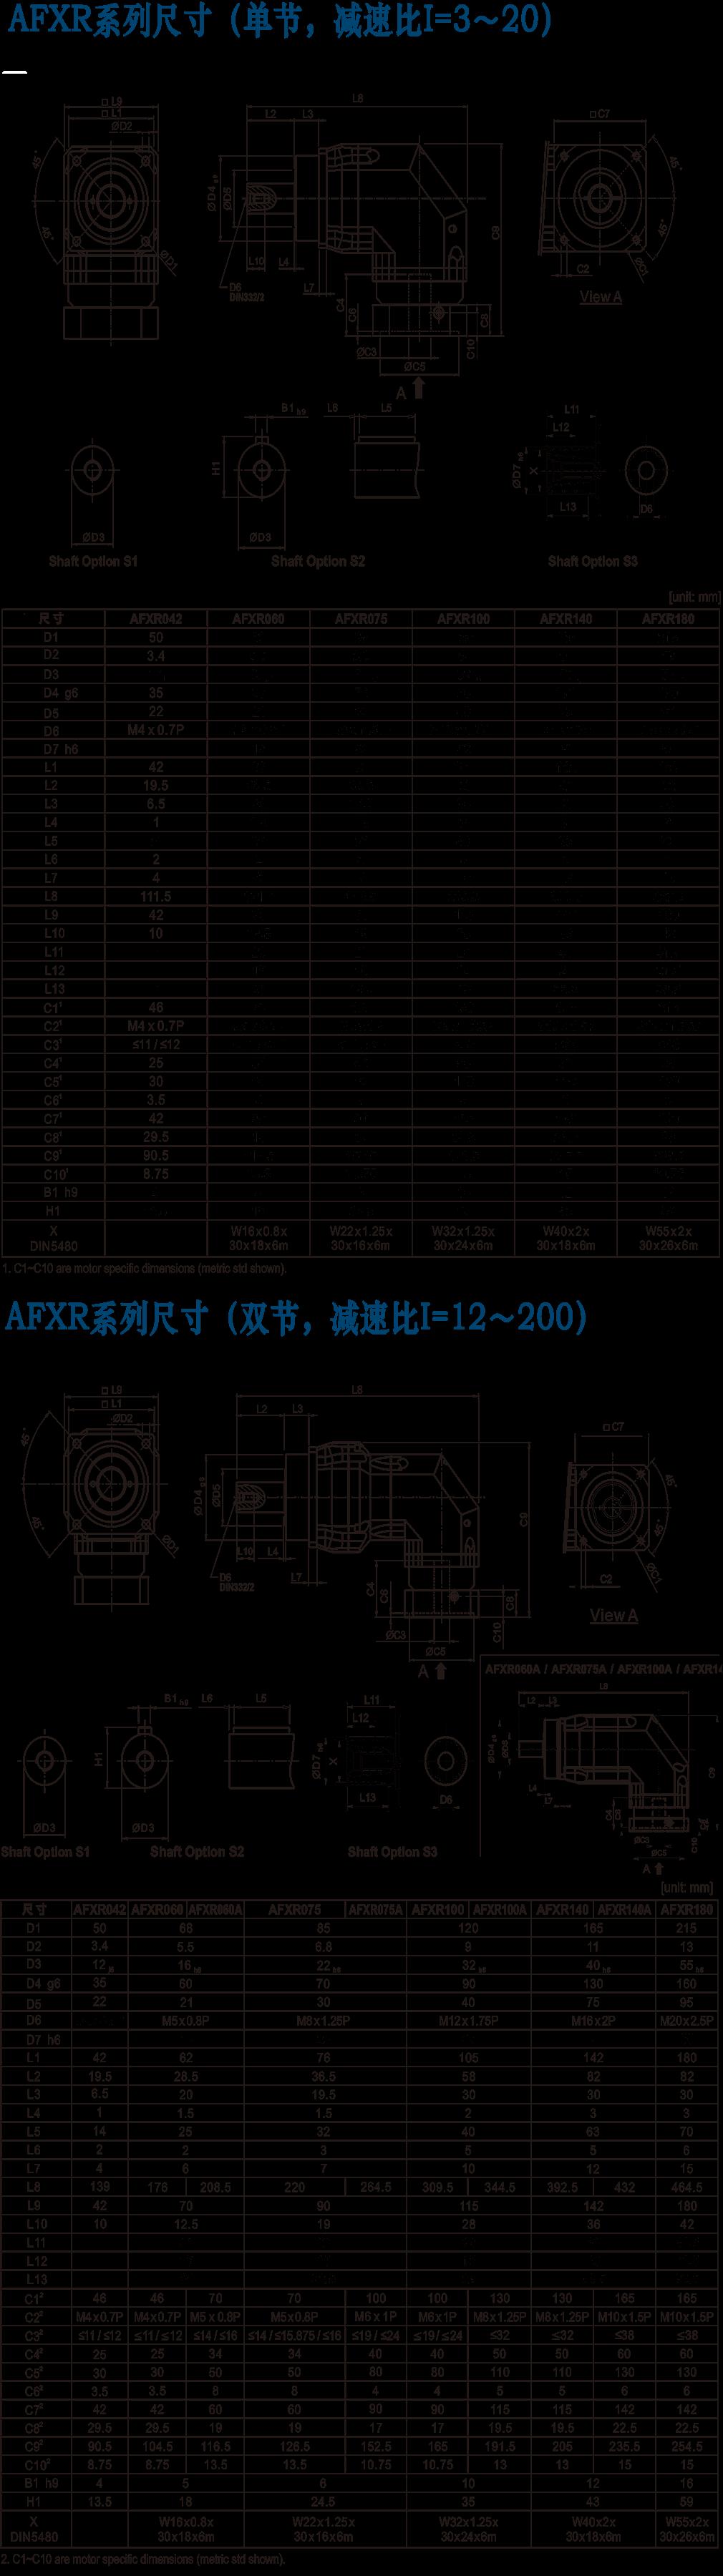 AFXR-精密伺服xing星jian速机.png